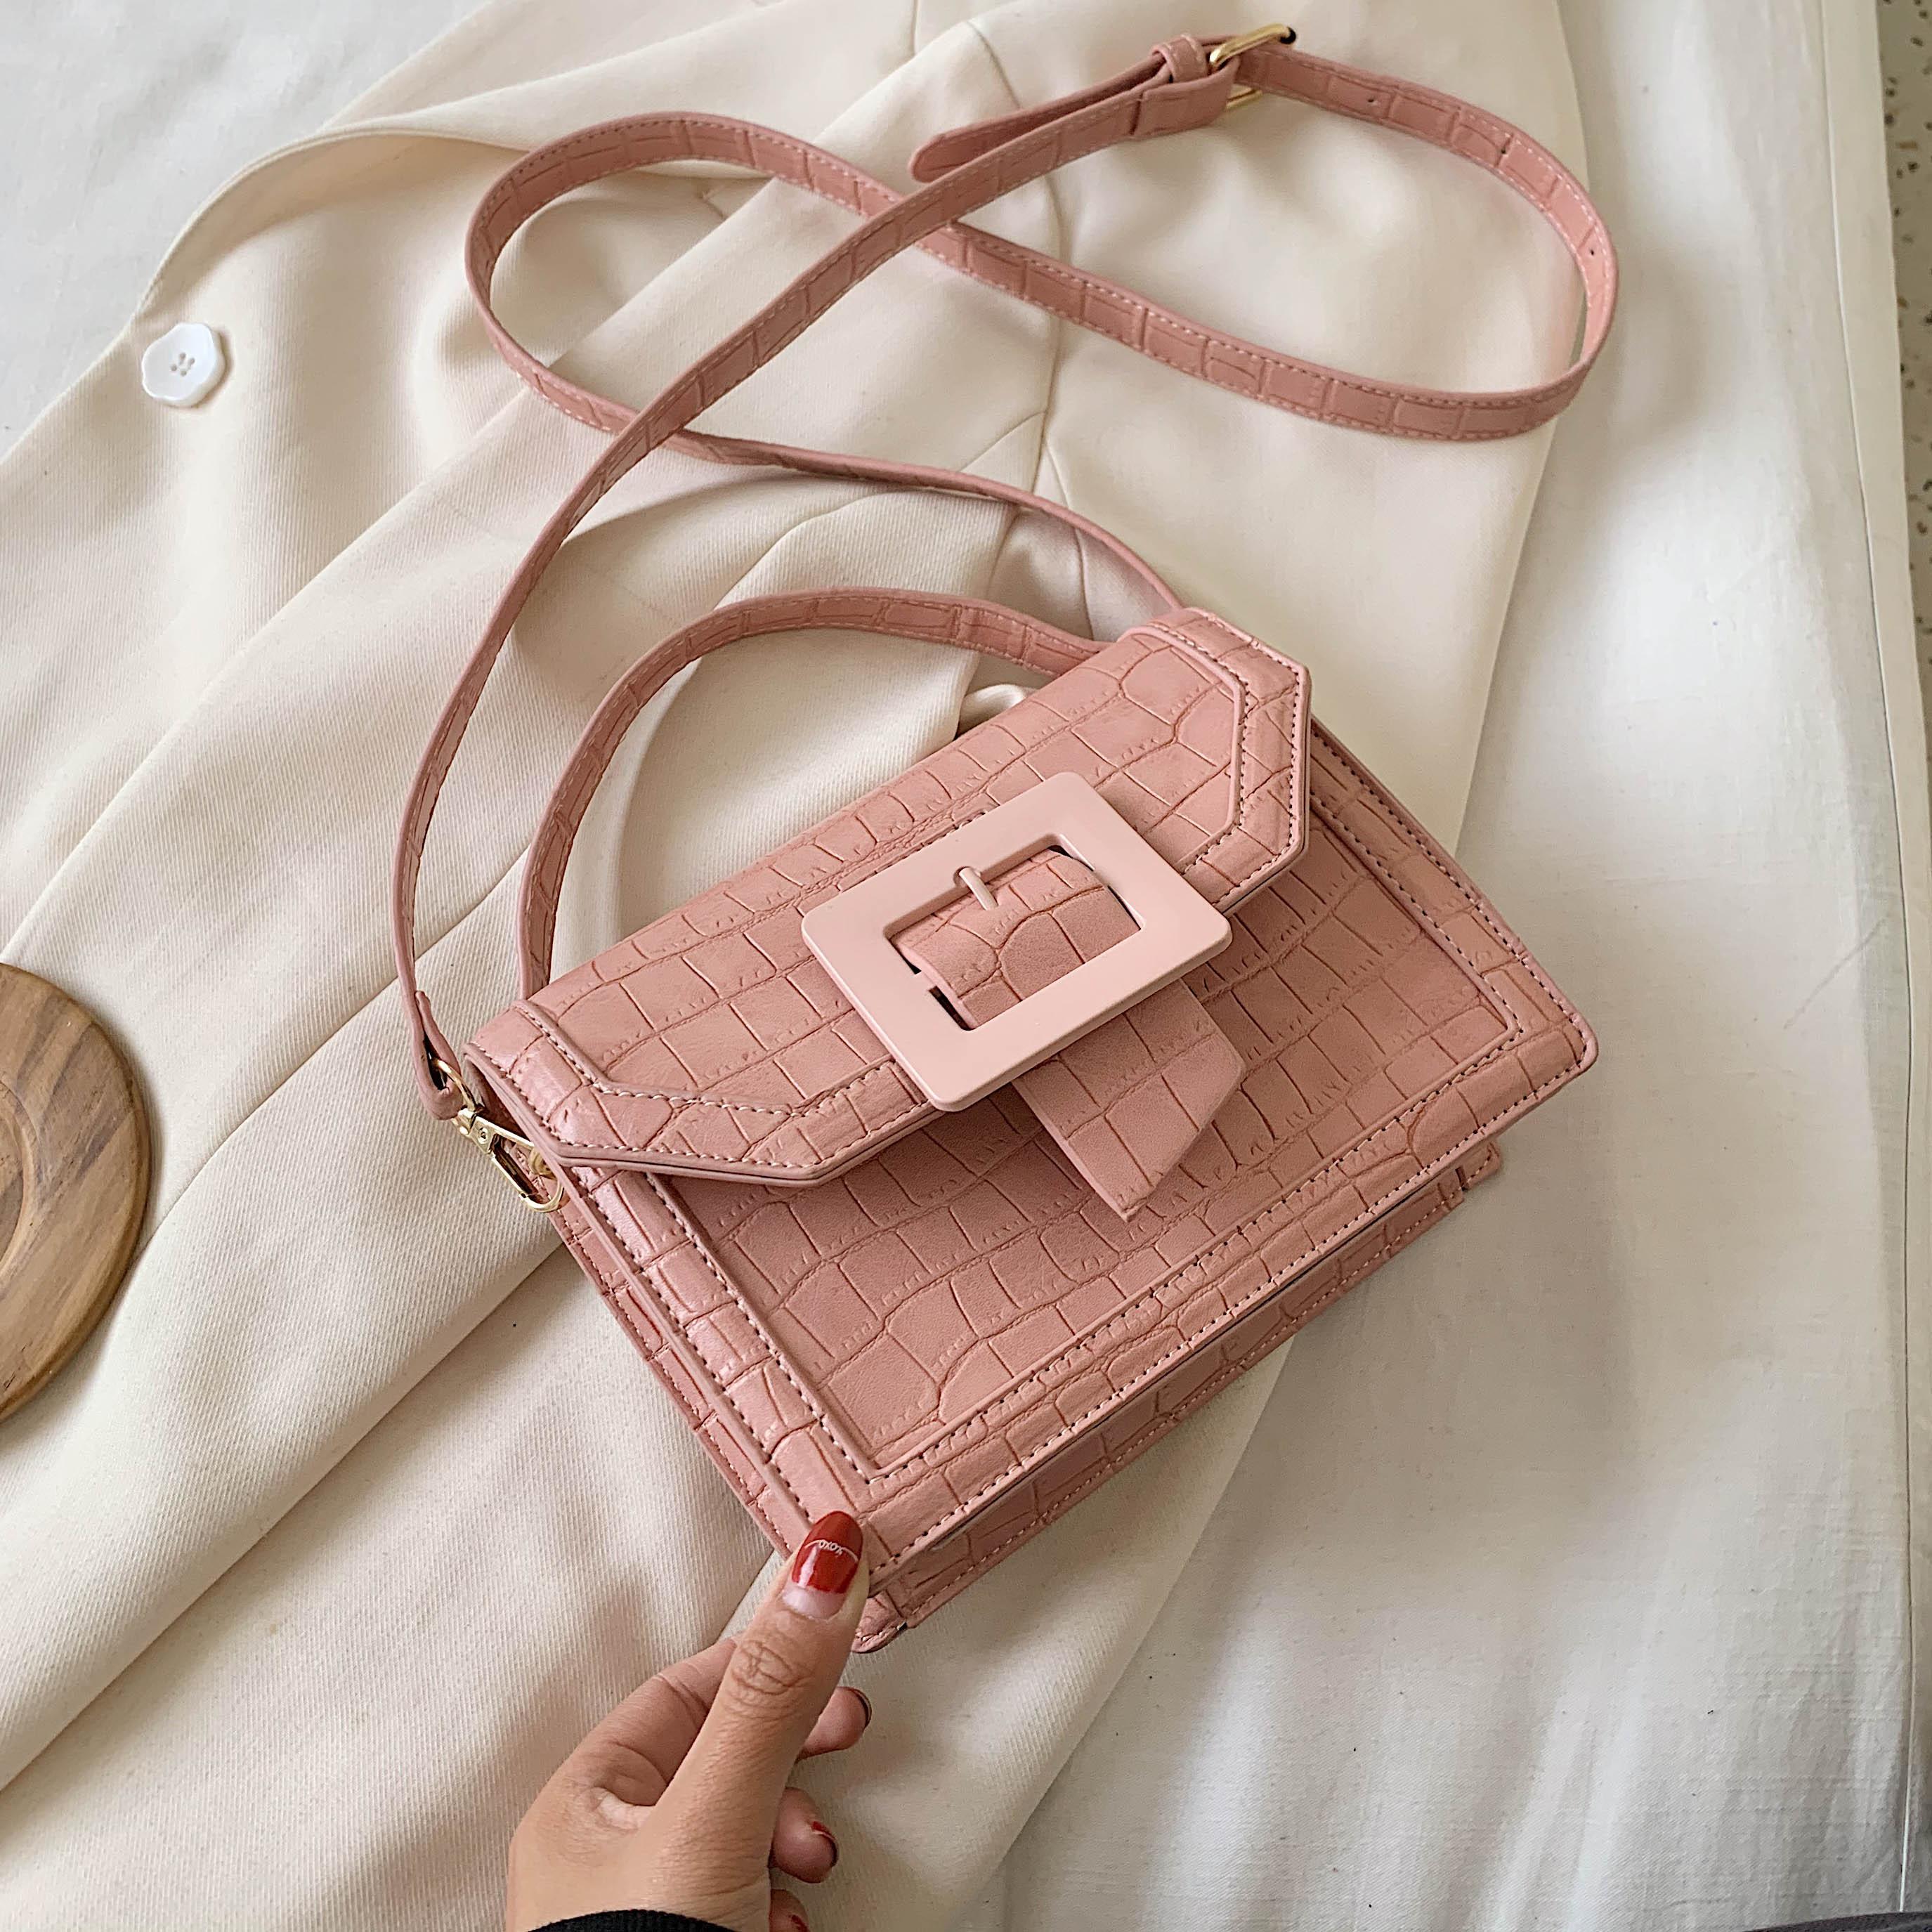 Stone Pattern PU Leather Flap Bag For Women 2020 Small Totes Female Crossbody Shoulder Handbag Lady Cute Travel Bag